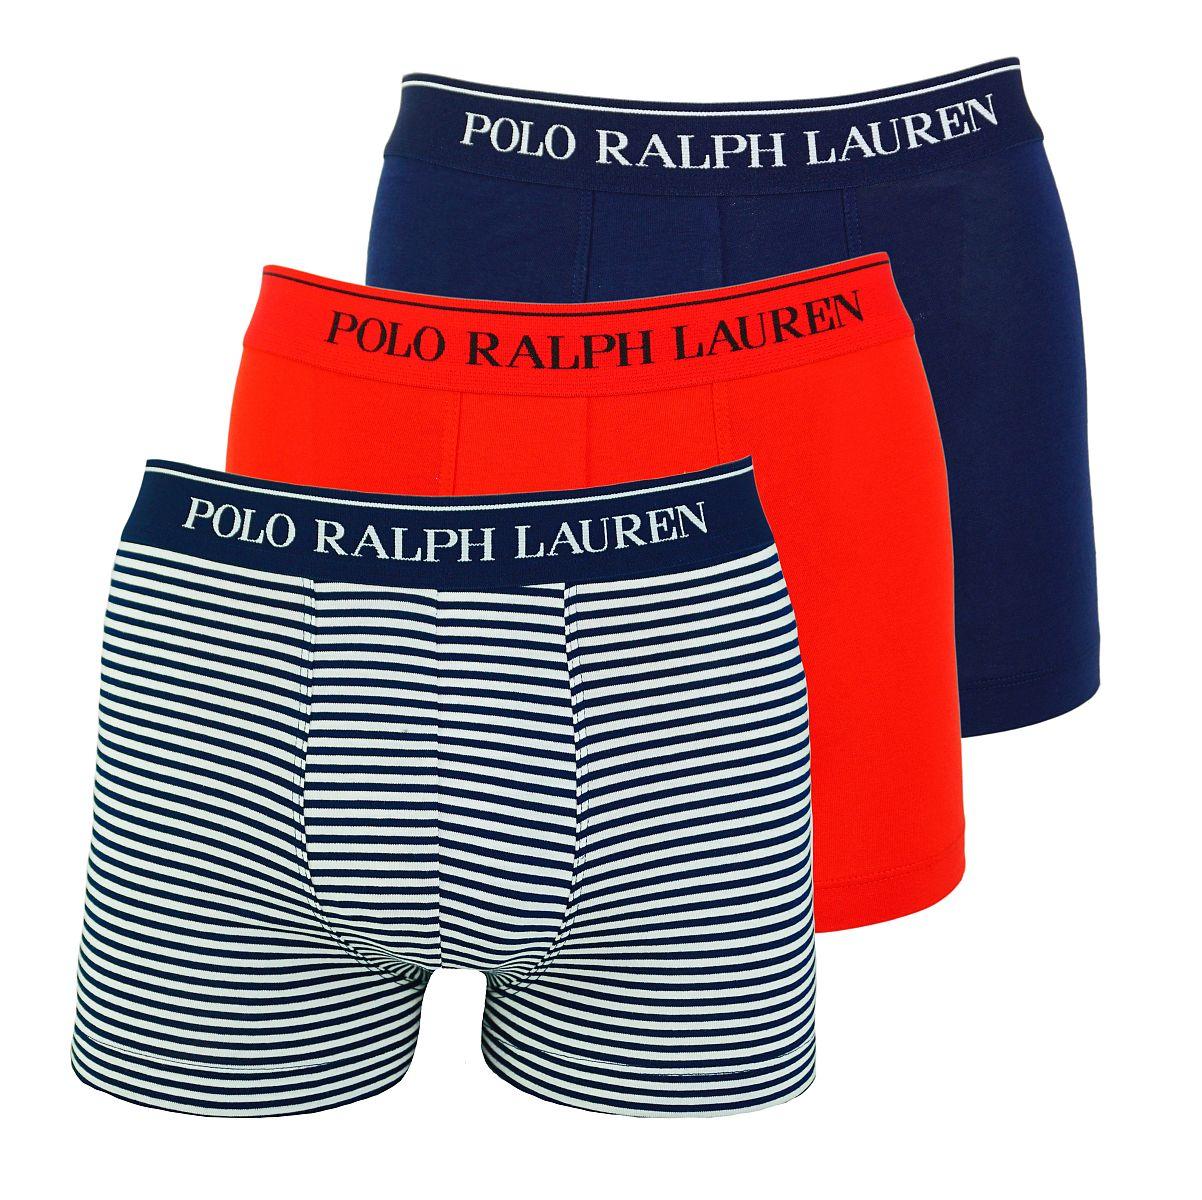 Ralph Lauren 3er Pack Boxershorts Trunks Spring1UDW RED/NAVY STRIPE/NAVY W18-US1